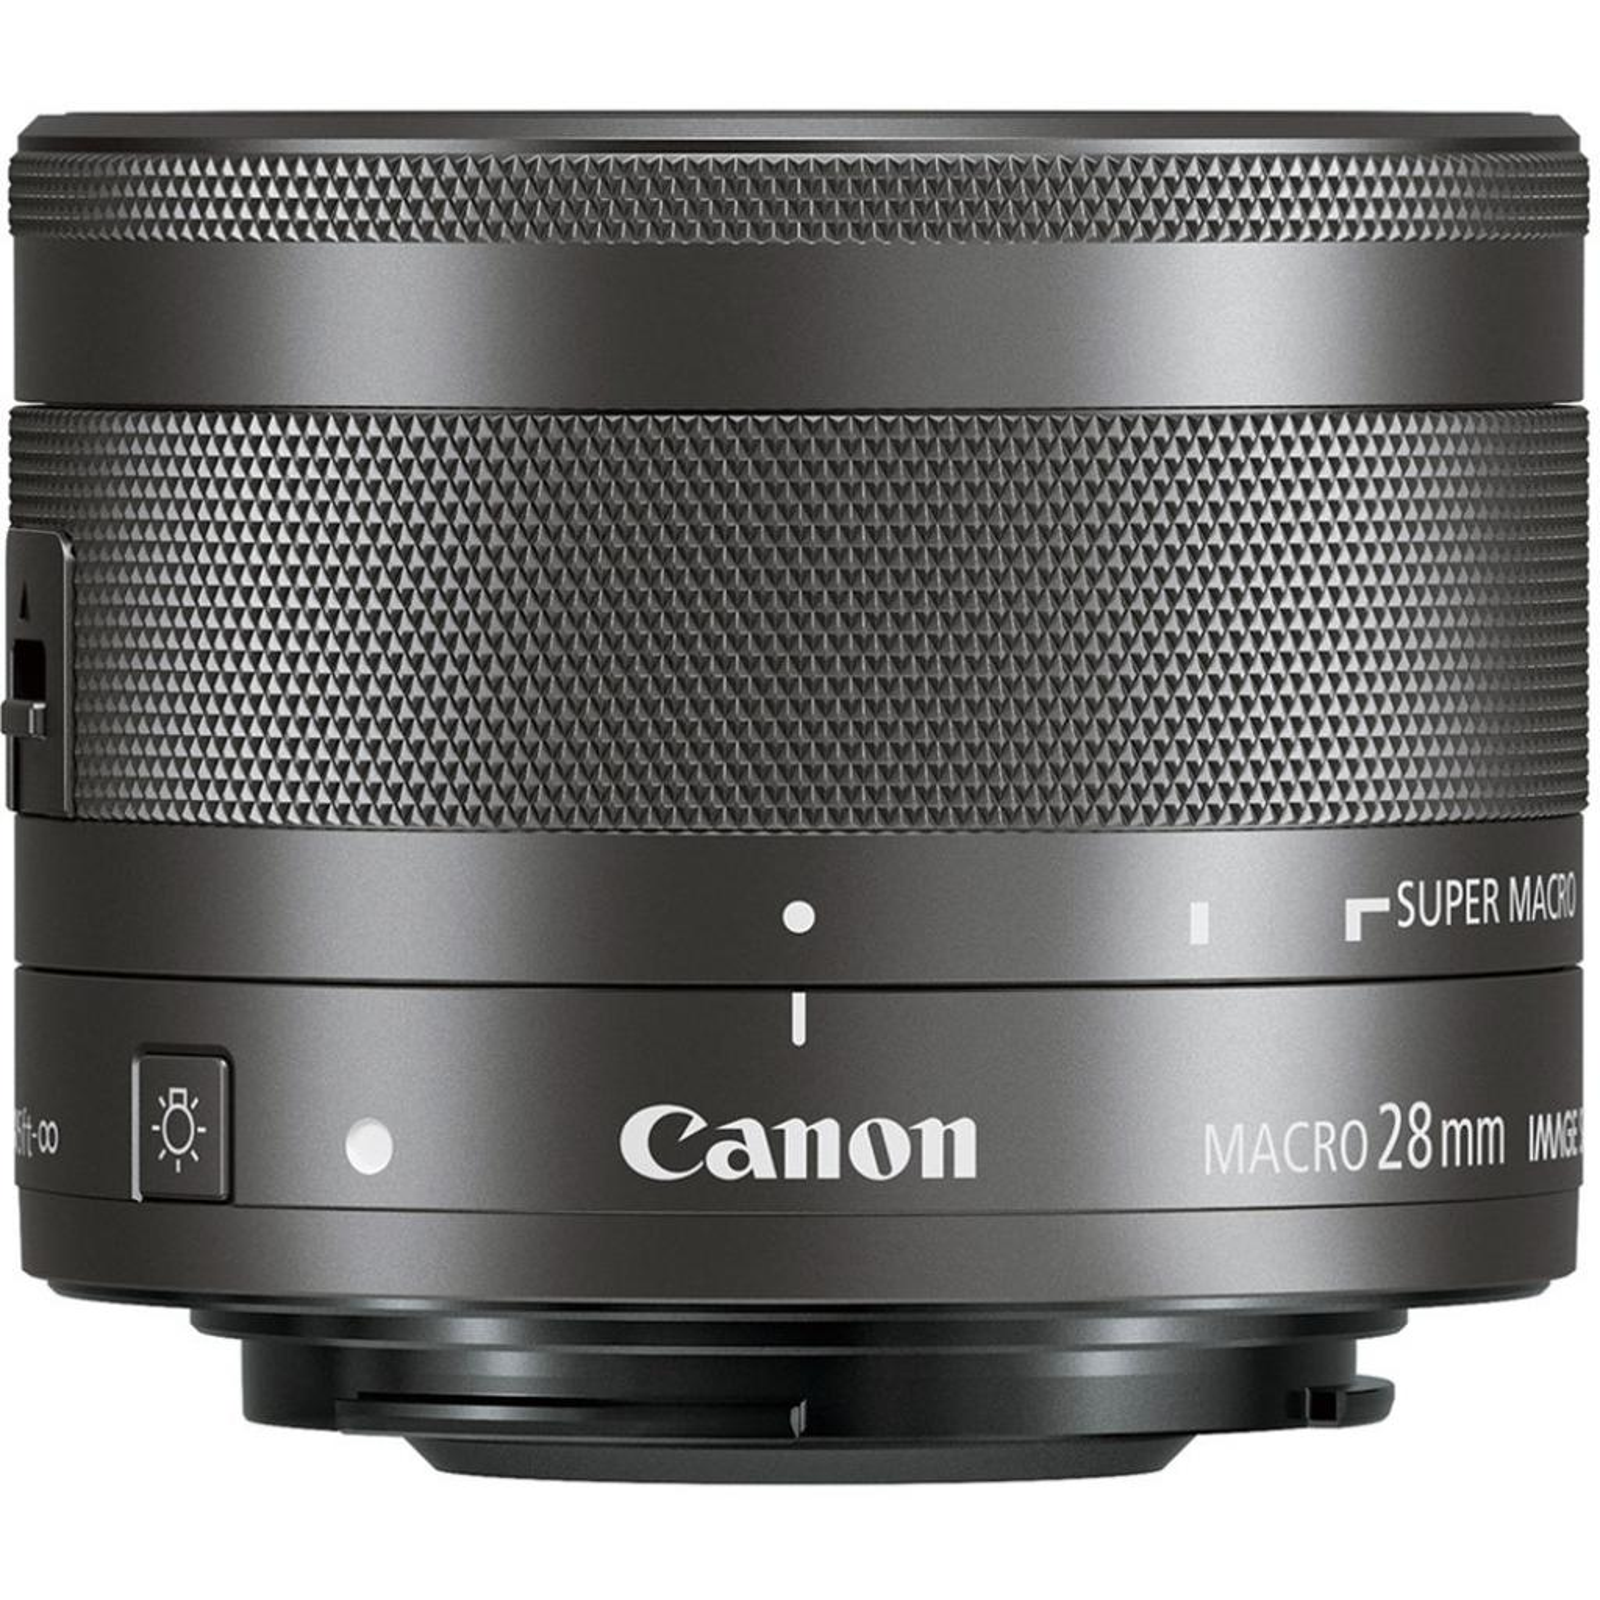 Объектив Canon EF-M 28mm f/3.5 Macro STM (1362C005)